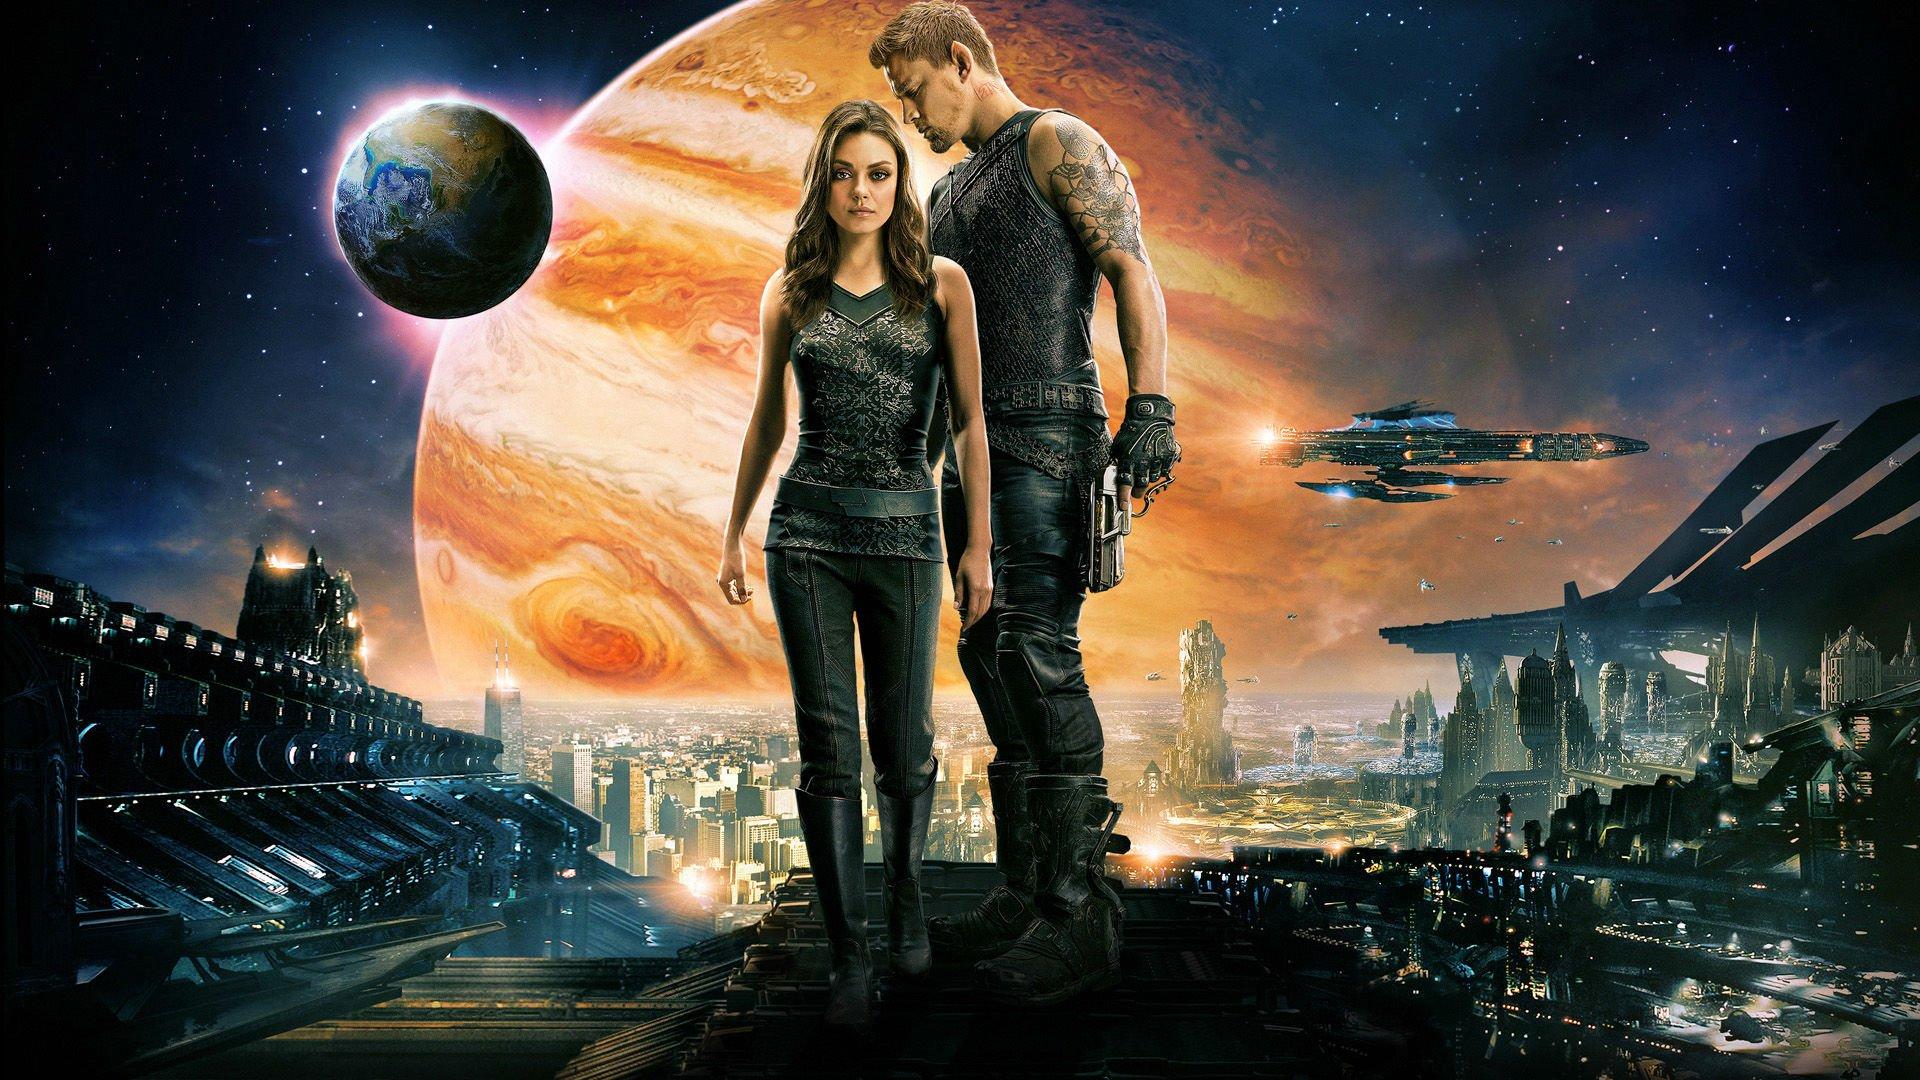 Jupiter Ascending Retina Movie Wallpaper: JUPITER ASCENDING Action Adventure Sci-fi Futuristic Gh